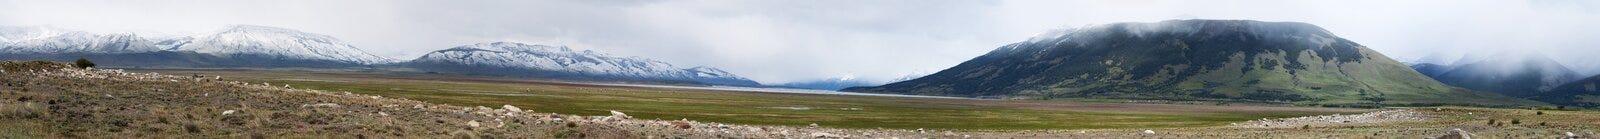 EL Calafate, parco nazionale dei ghiacciai, Patagonia, Argentina, Sudamerica Immagini Stock Libere da Diritti